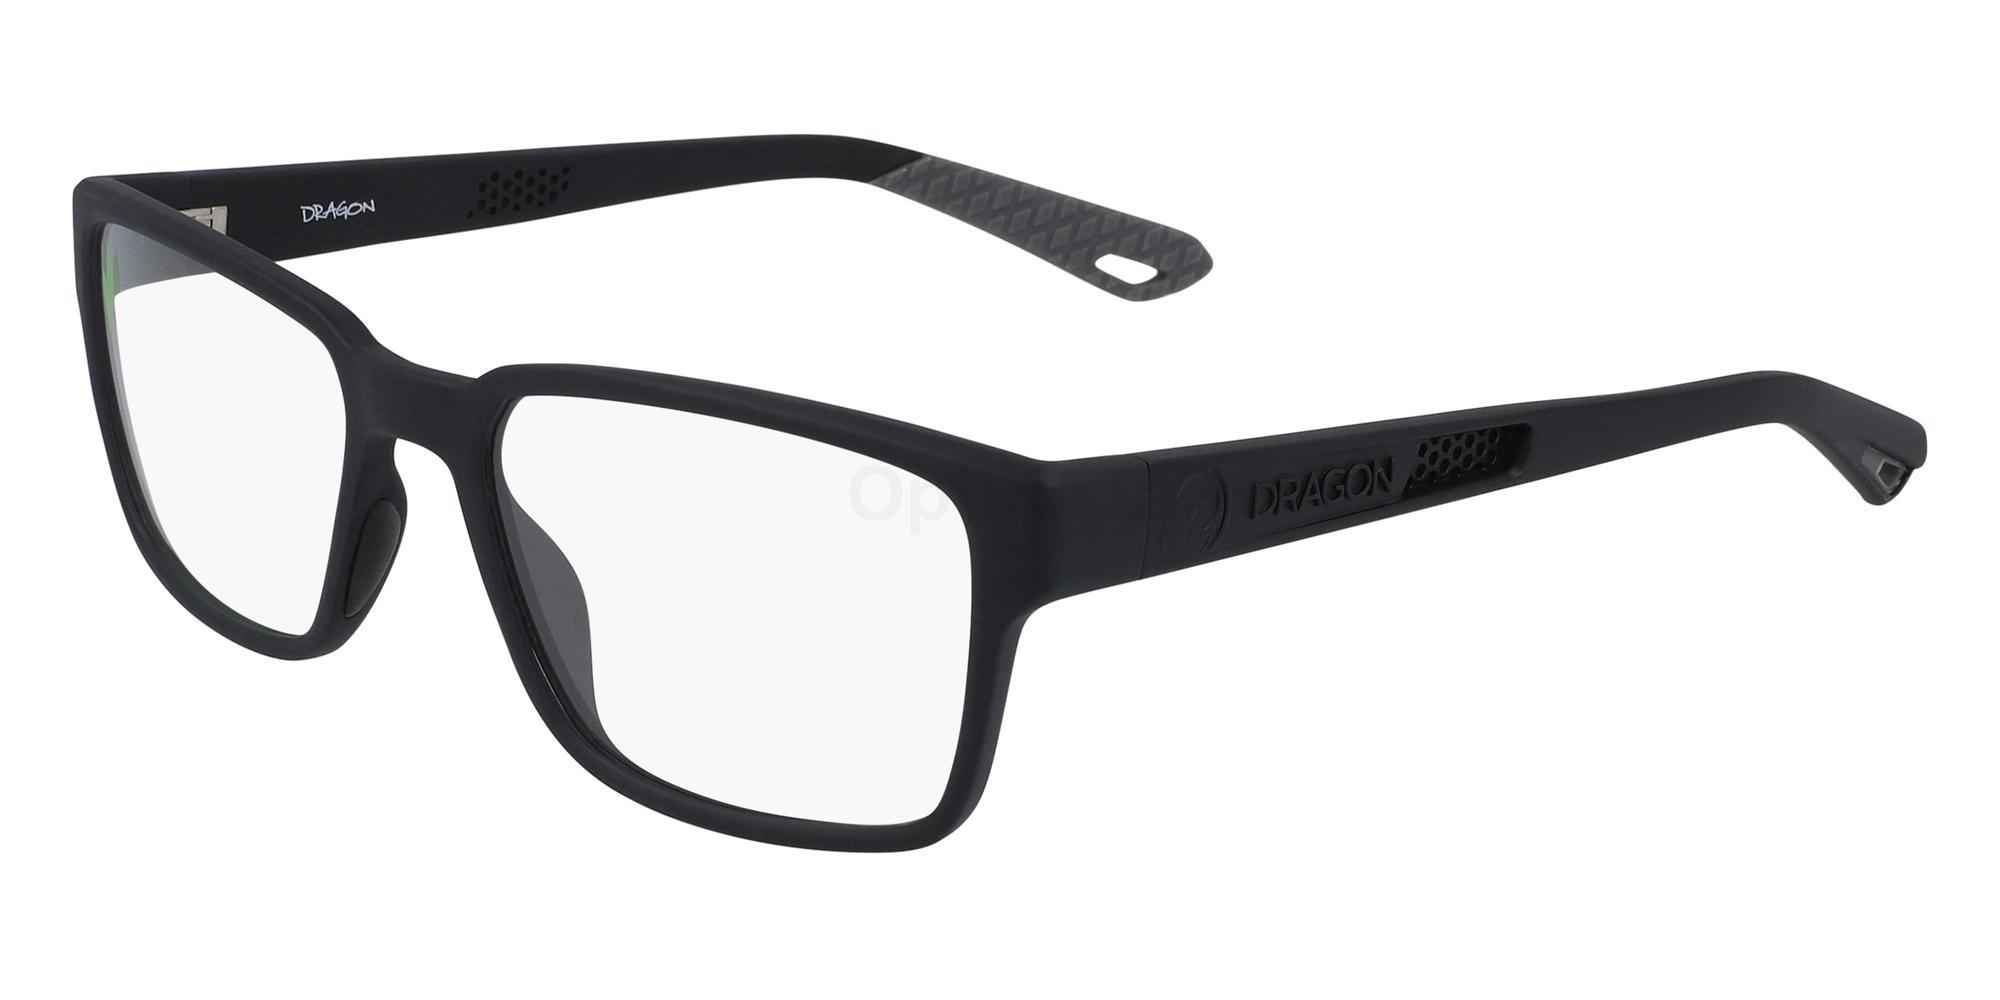 002 DR5003 Glasses, Dragon